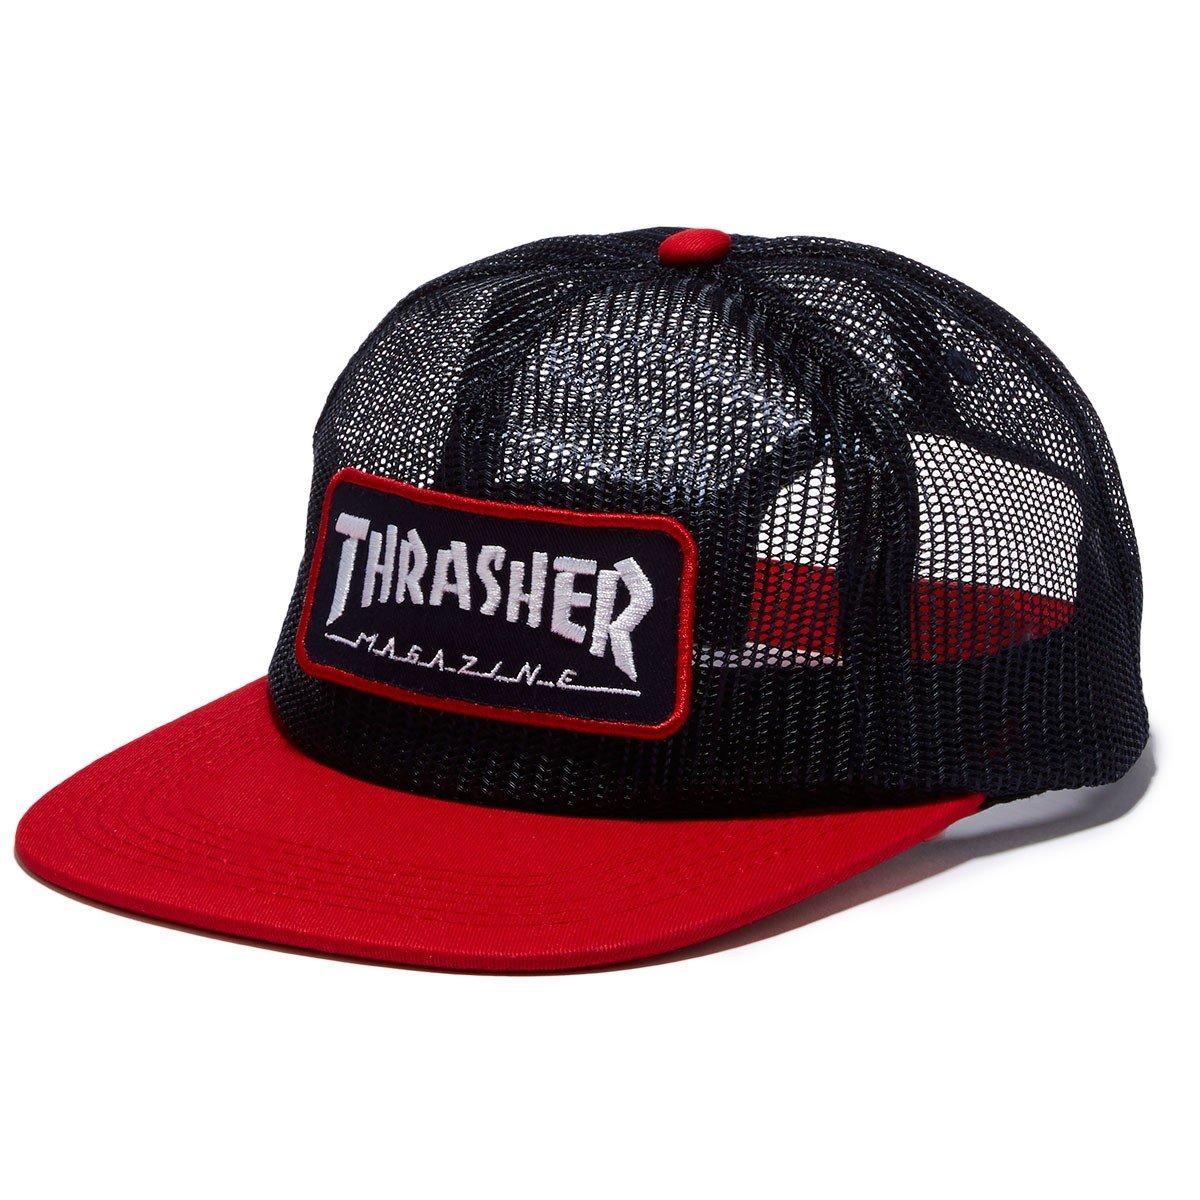 83cf09ac47e Thrasher Skategoat Wool Blend Snap Blk Click to zoom. Thrasher Magazine